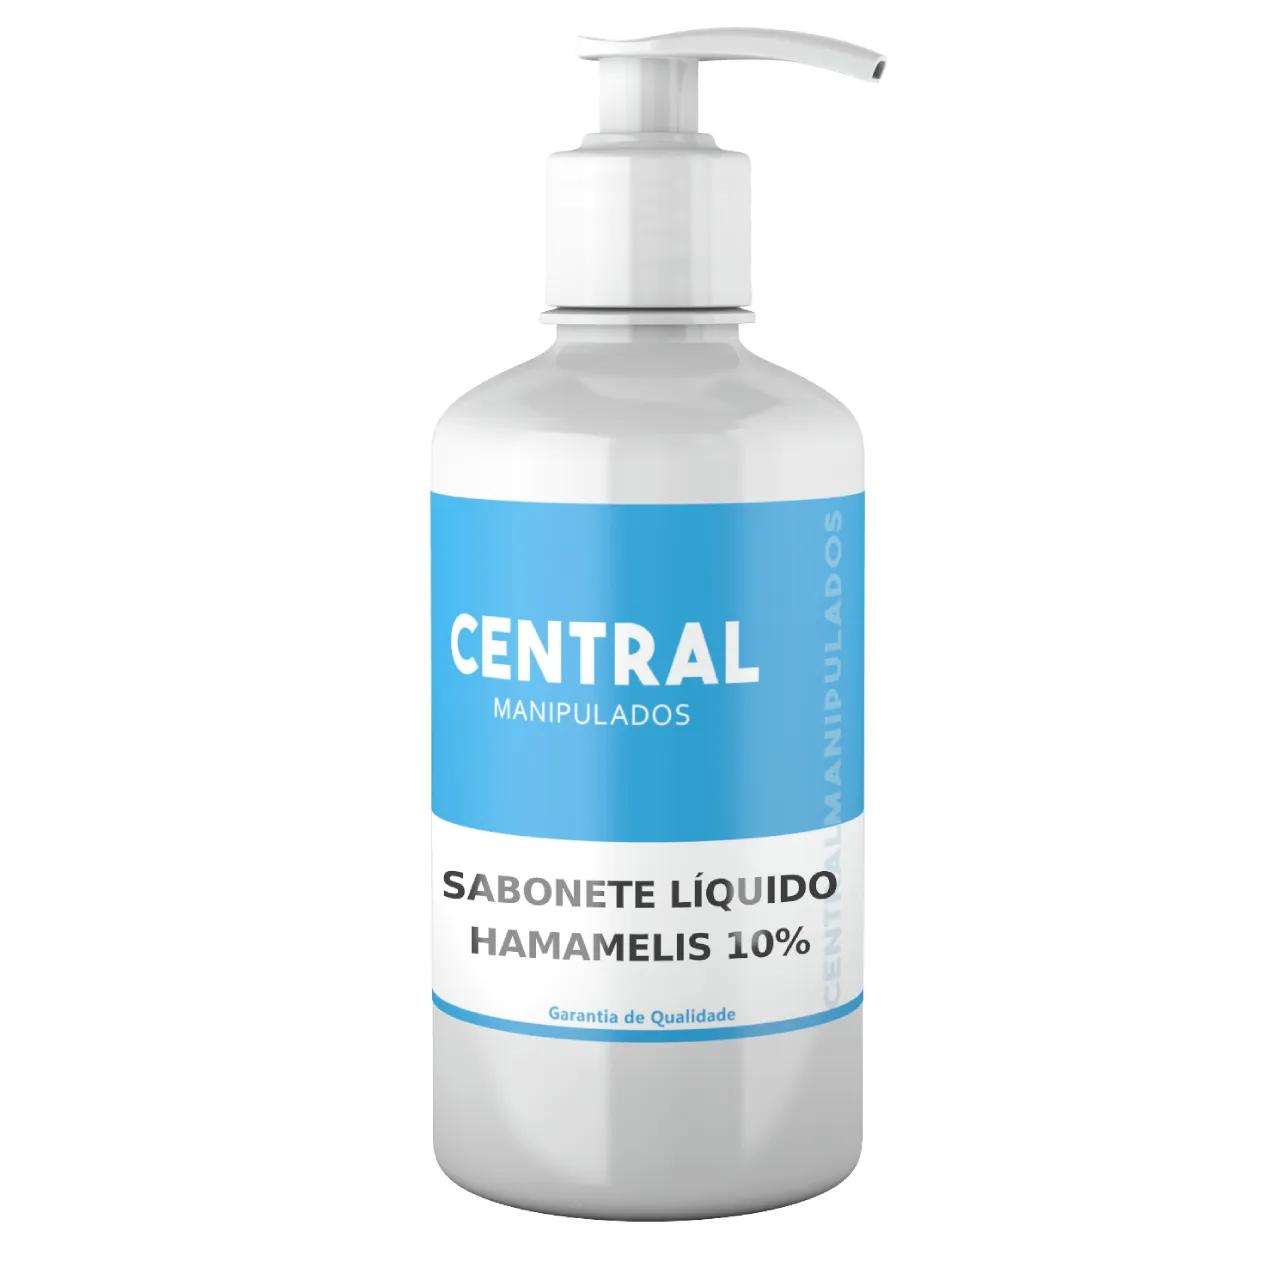 Sabonete Líquido Hamamelis 10% - 200mL